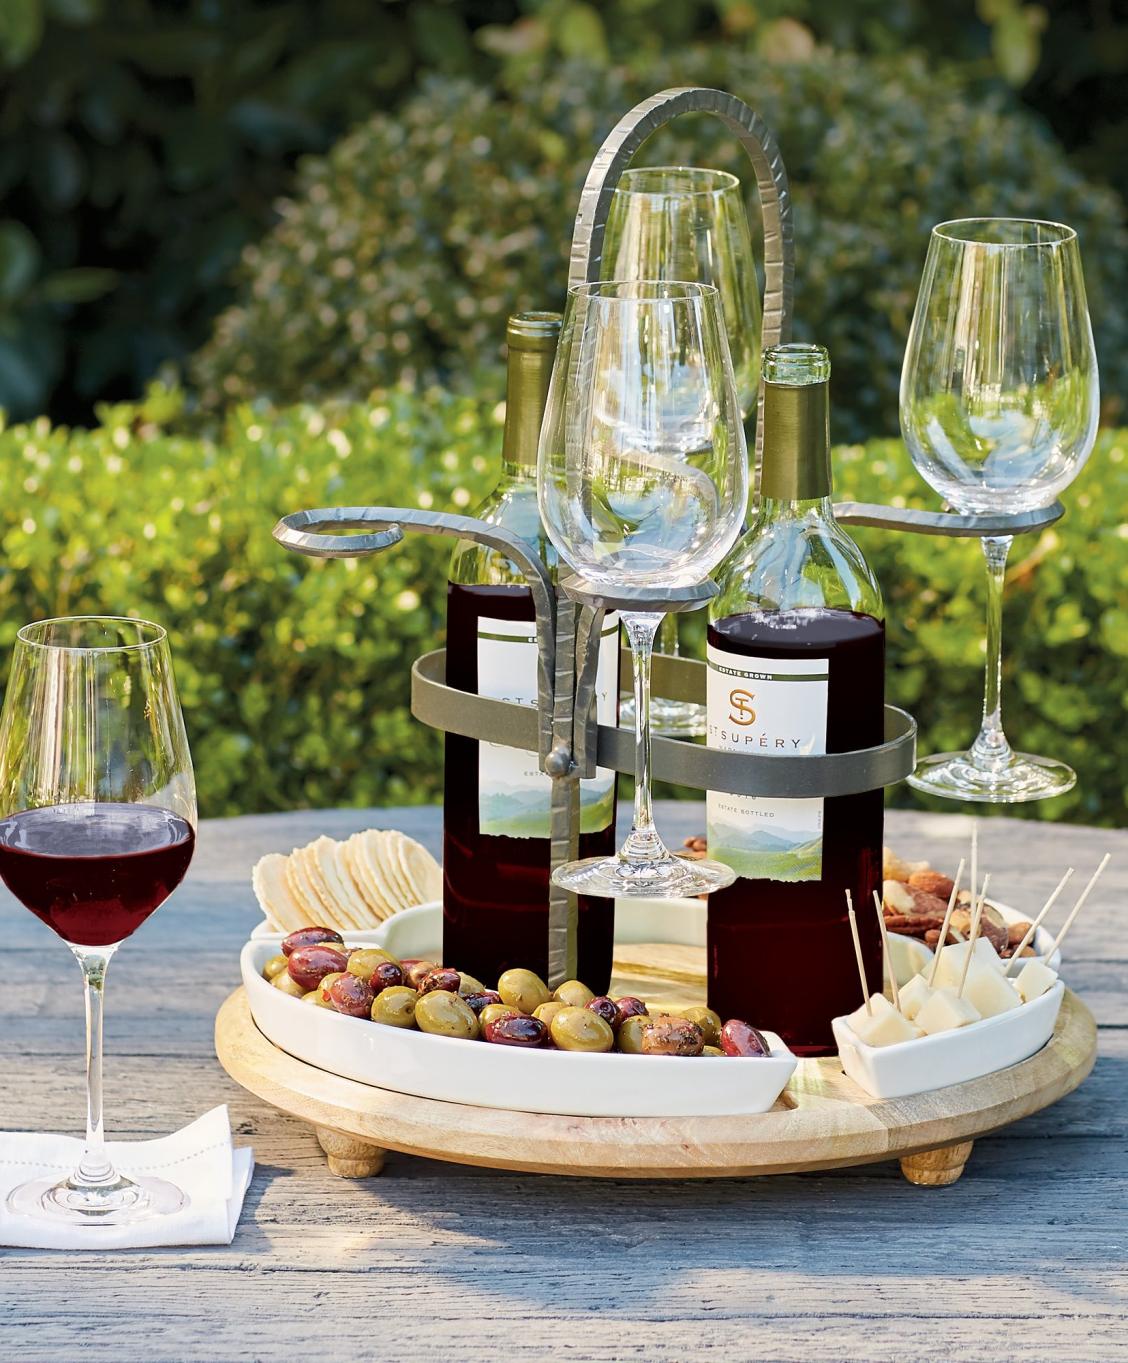 Weston Wine Caddy Frontgate Wine Caddy Wine House Wine Glass Holder